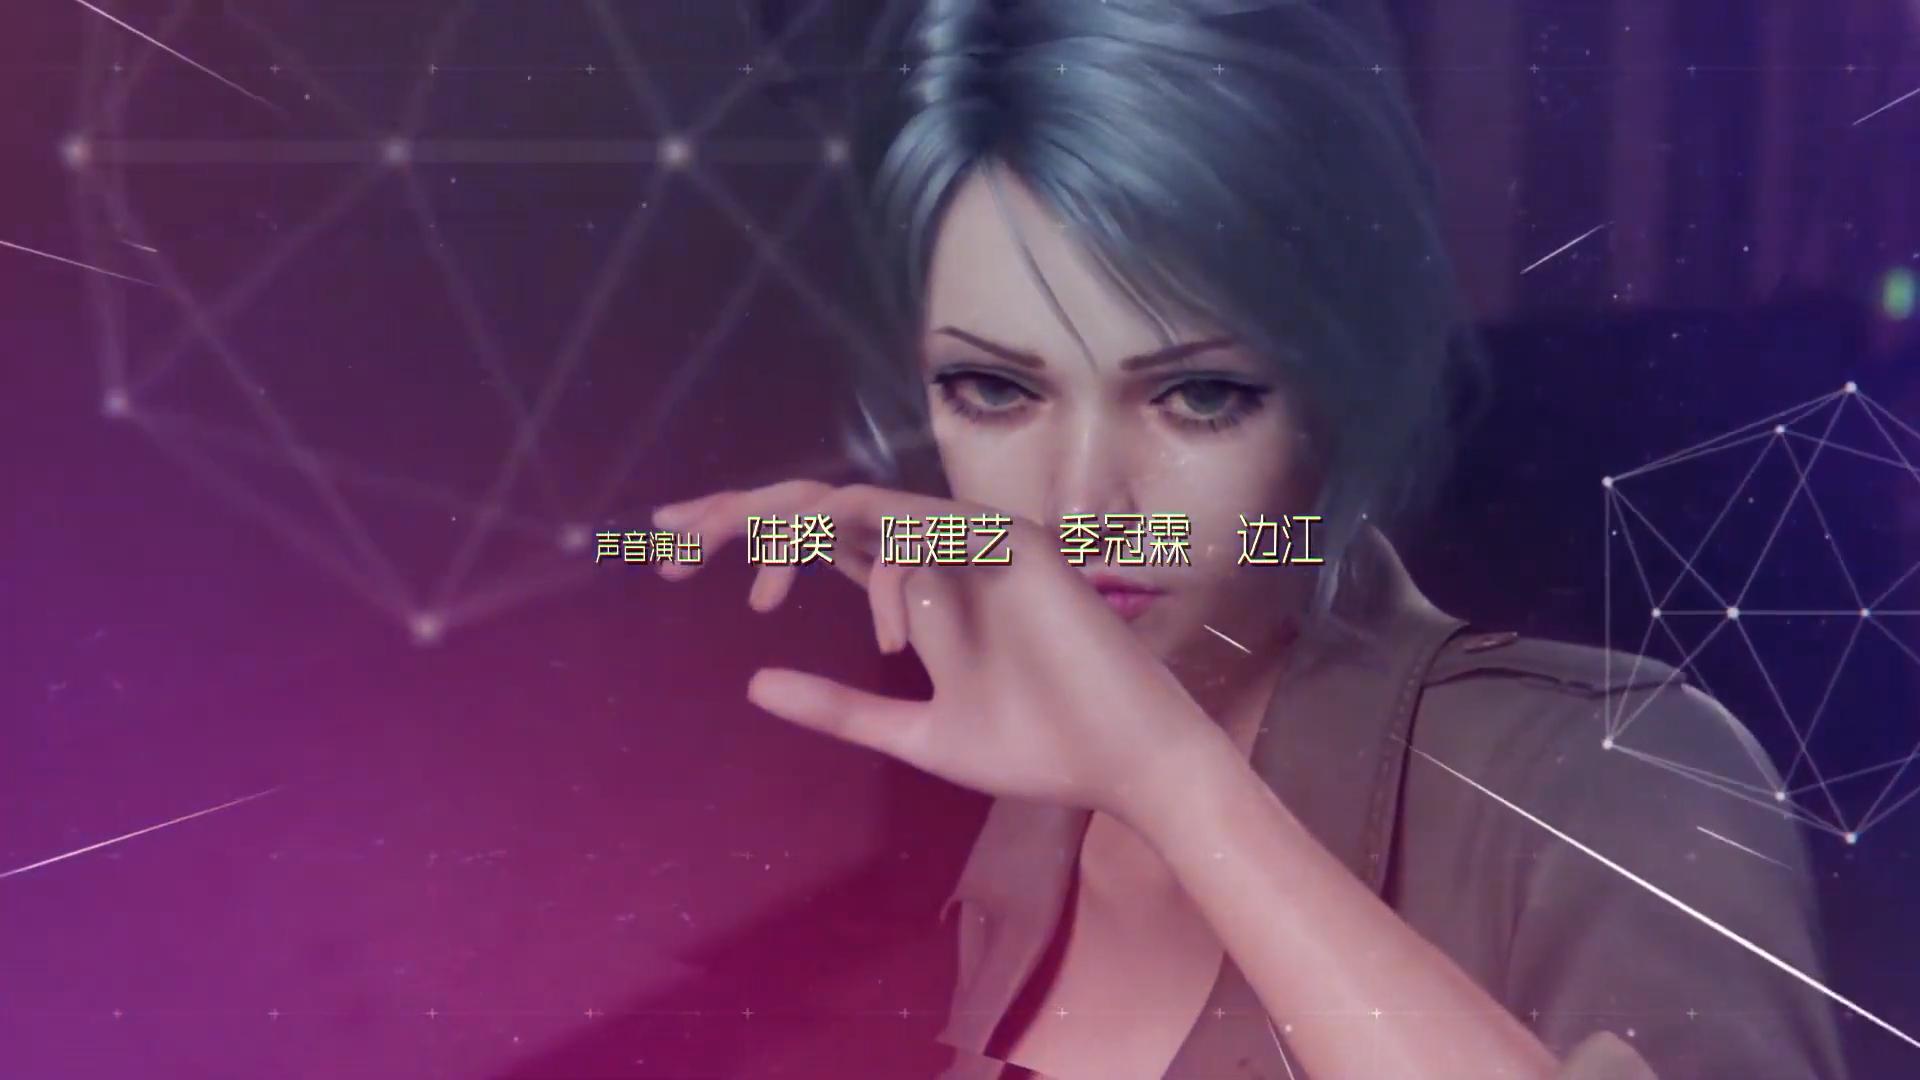 Watch online full 1080 HD (stream) : Moshi Juexing Zhi Ruqin - The Invasion of Awakening - 末世觉醒之入侵 ( chinese anime | donghua ) Season 1 episode 02 english sub